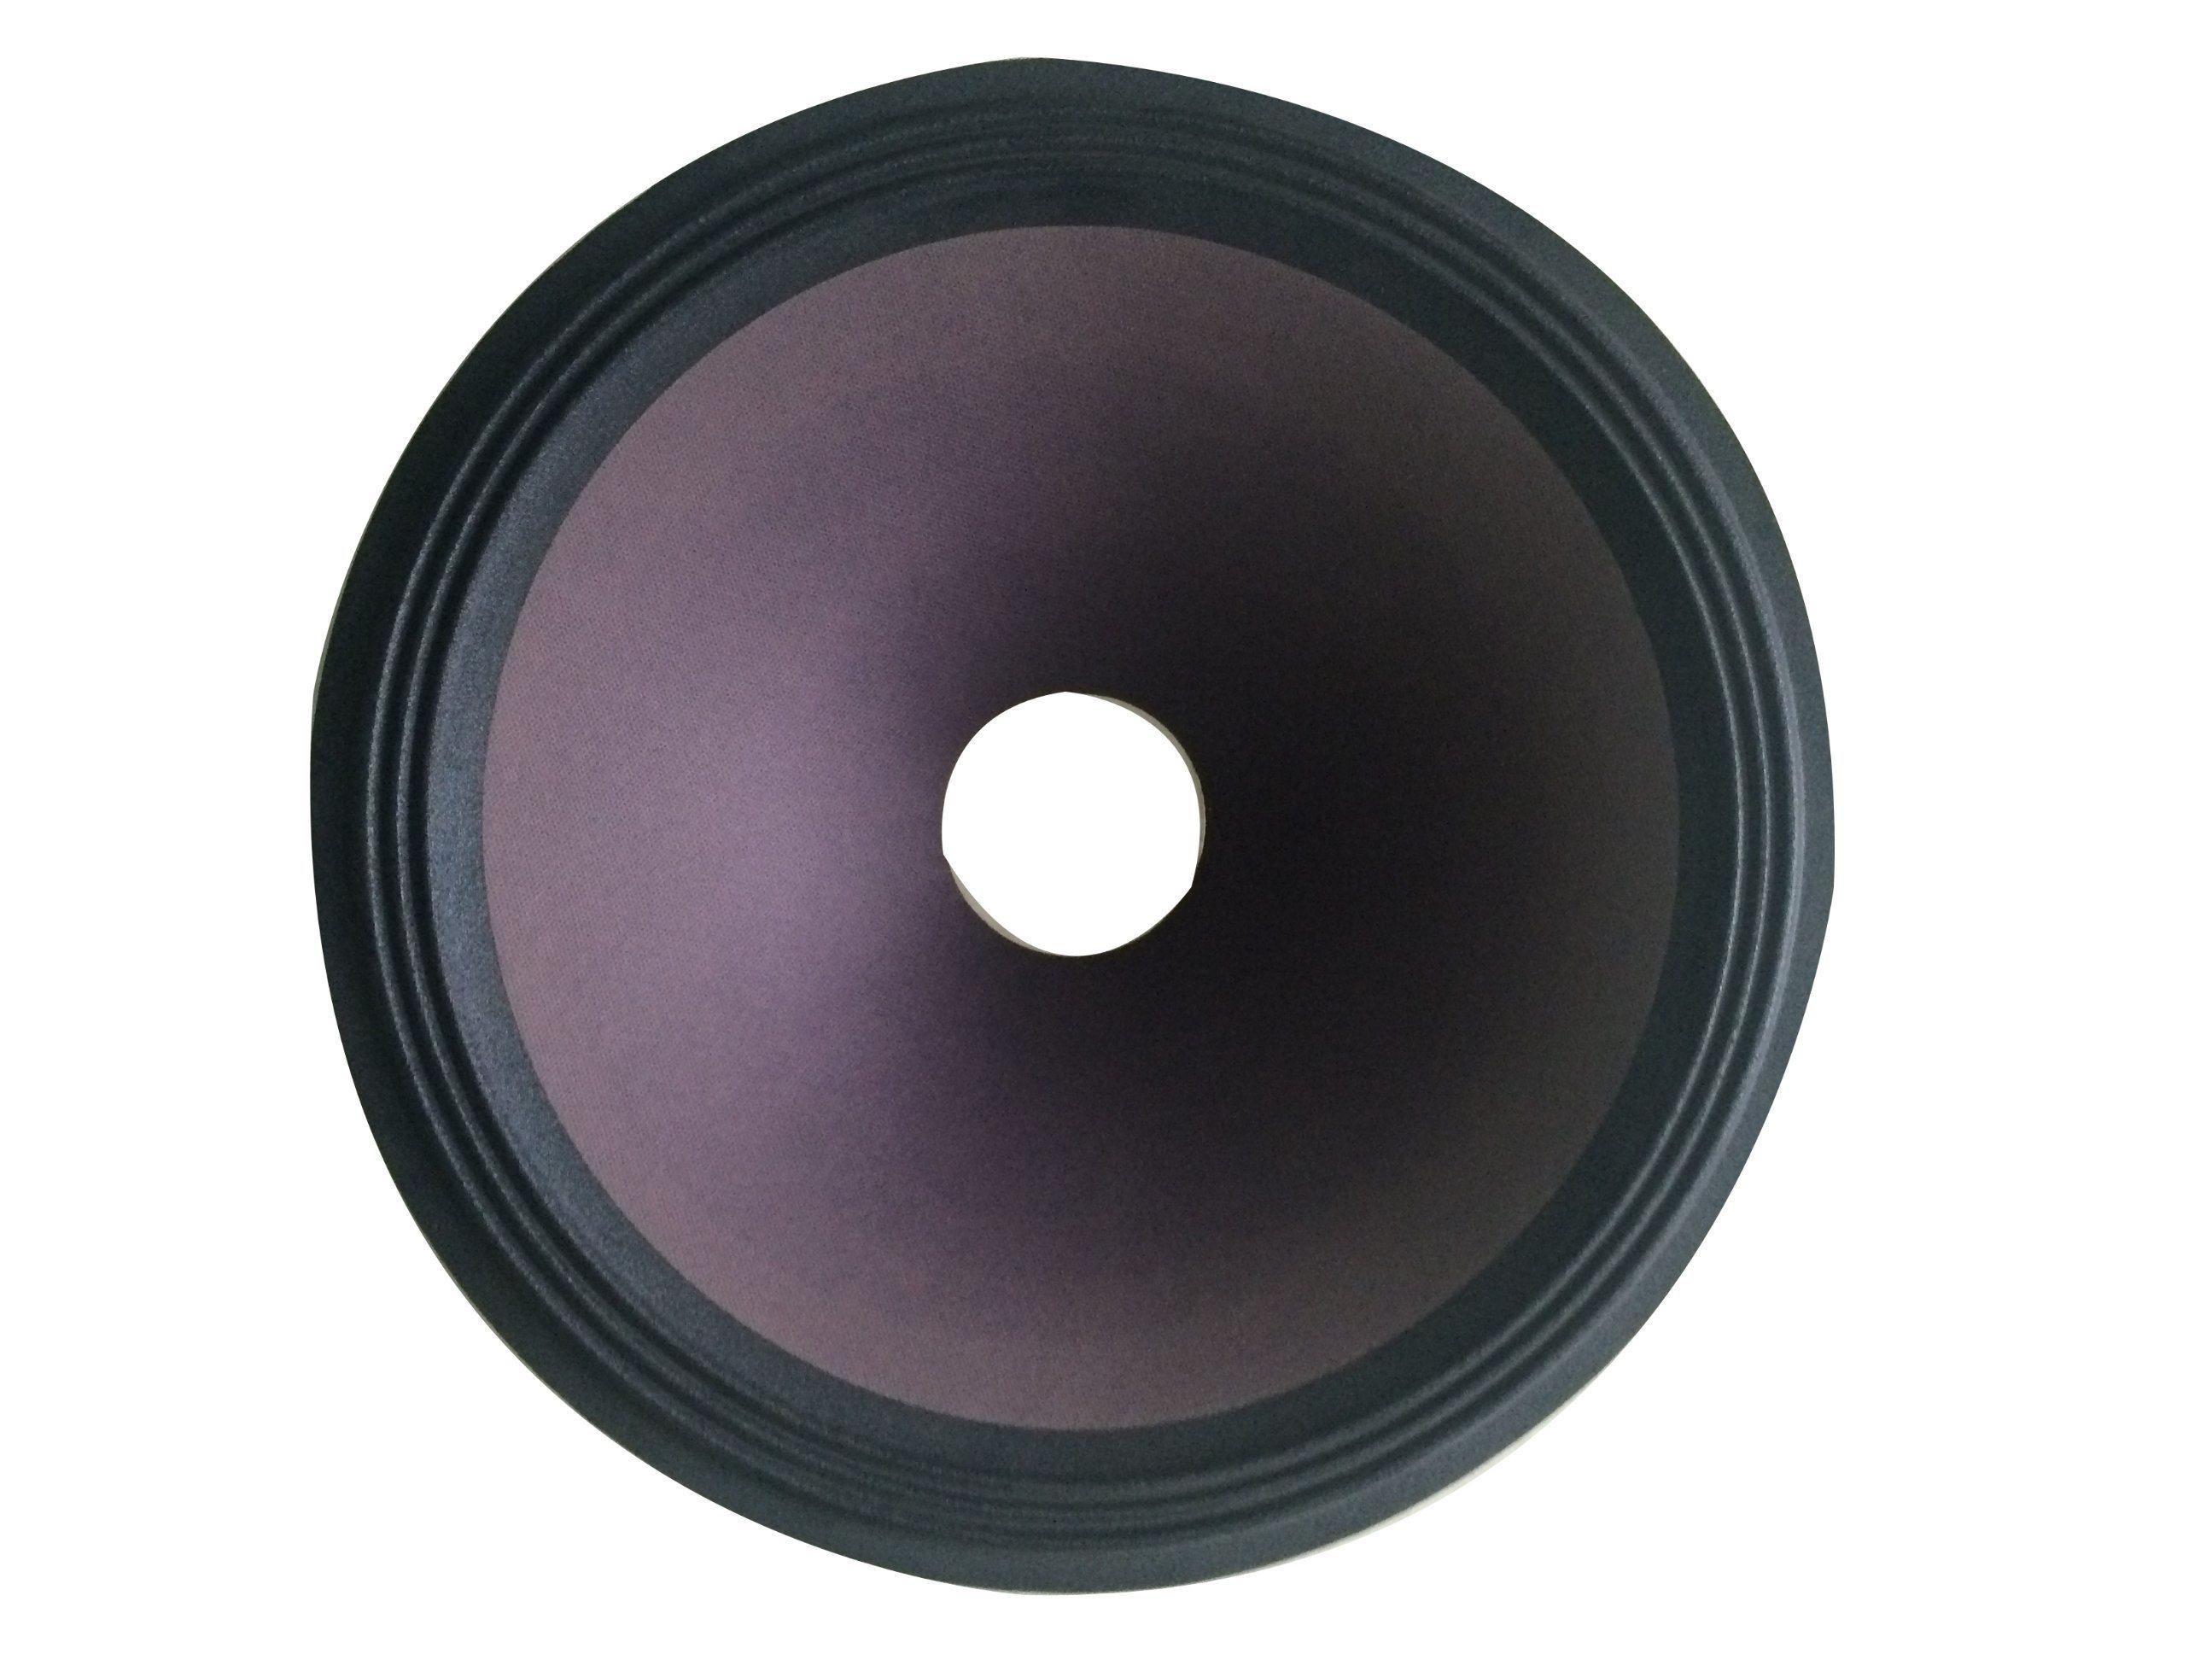 Best Price 2017 Free Sample Speaker Parts 15inch PA Paper Cone - Speaker Cone